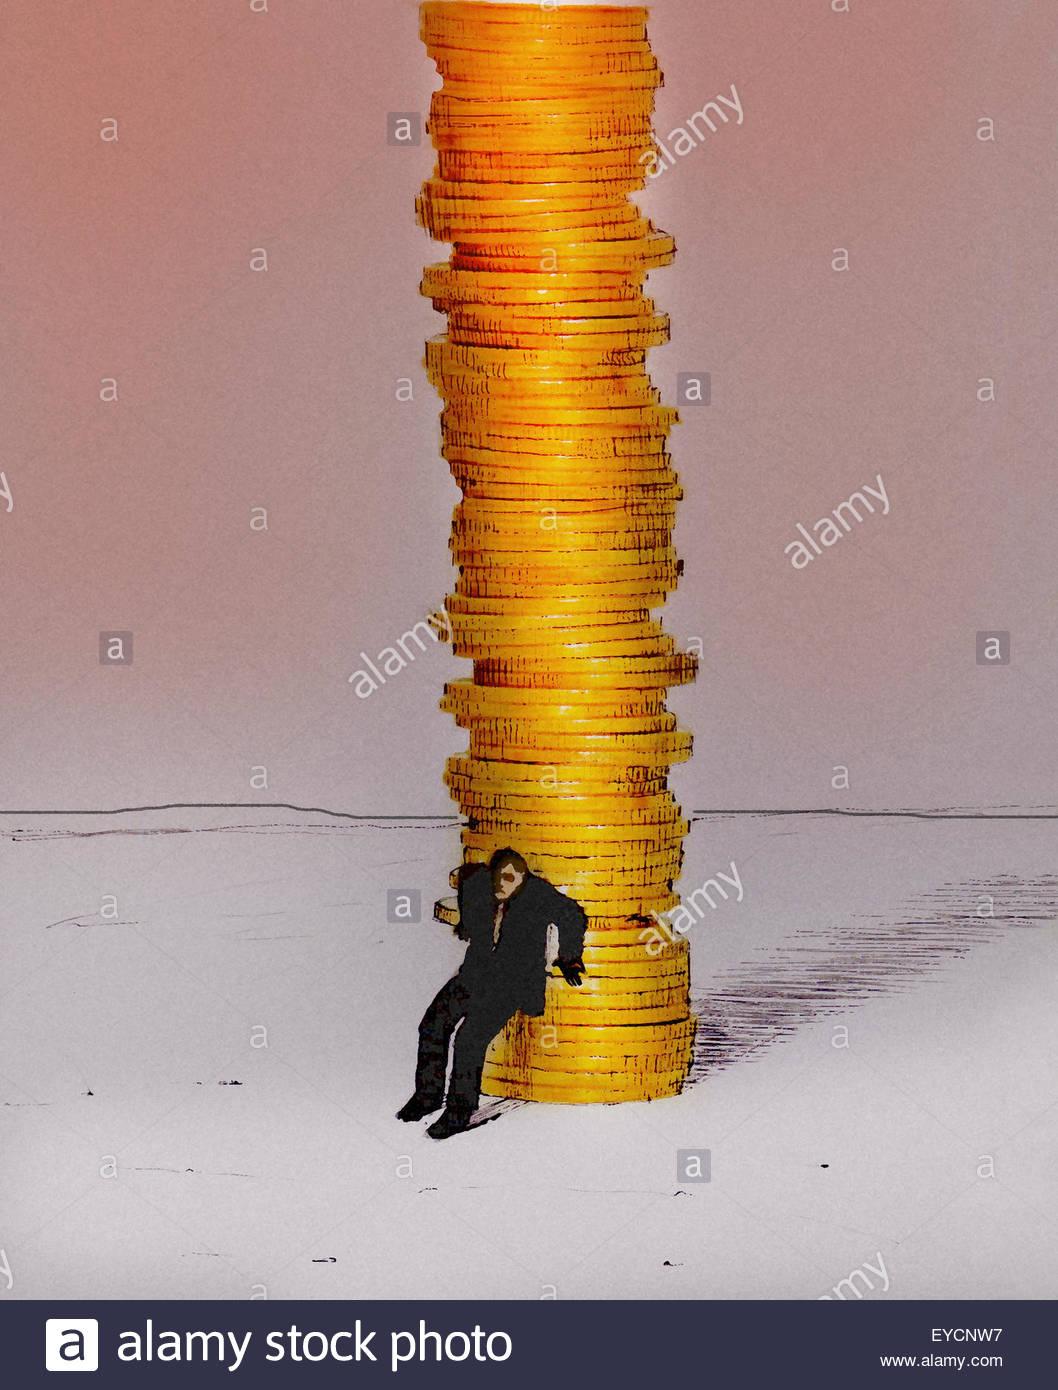 Businessman protecting large pile of money - Stock Image